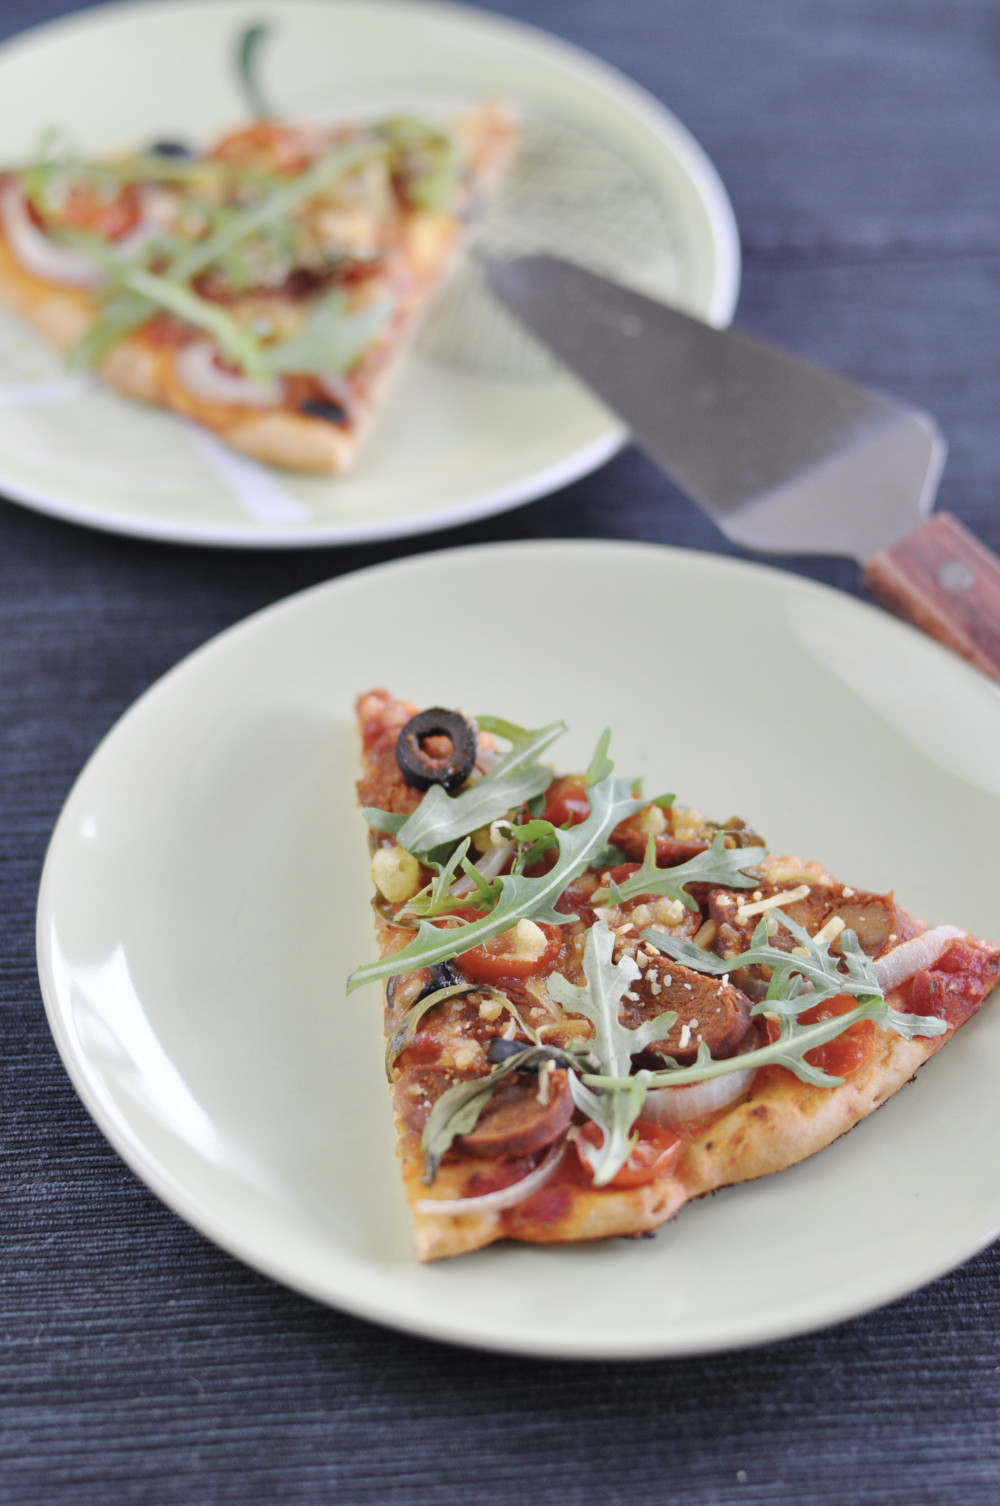 Quick Yeast-free Vegan Pizza with Chorizo and Onion